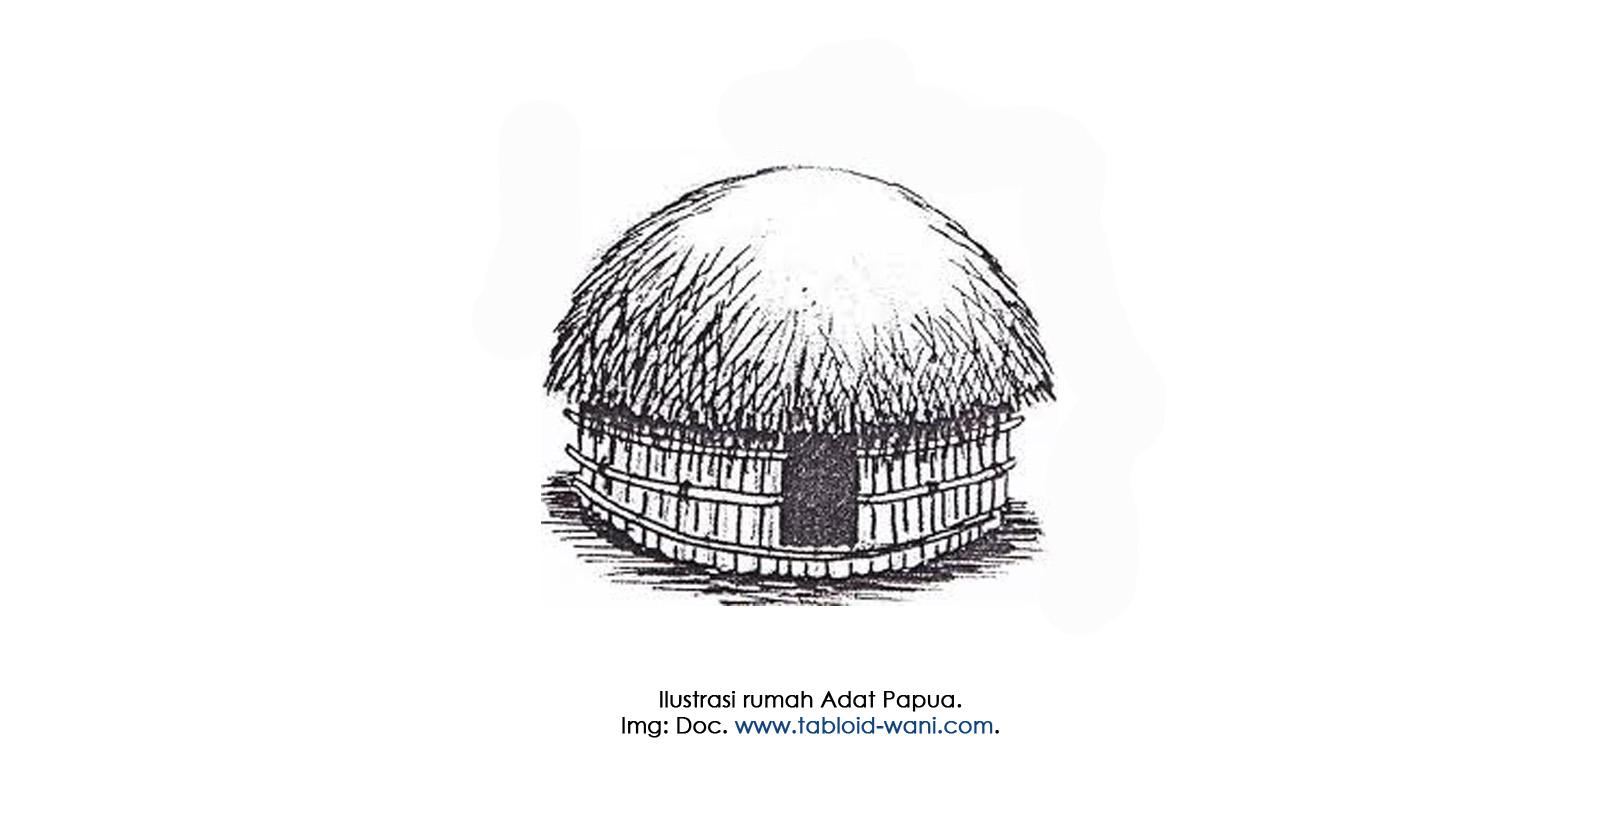 Gambar Mewarnai Rumah Adat Papua Gambar Mewarnai